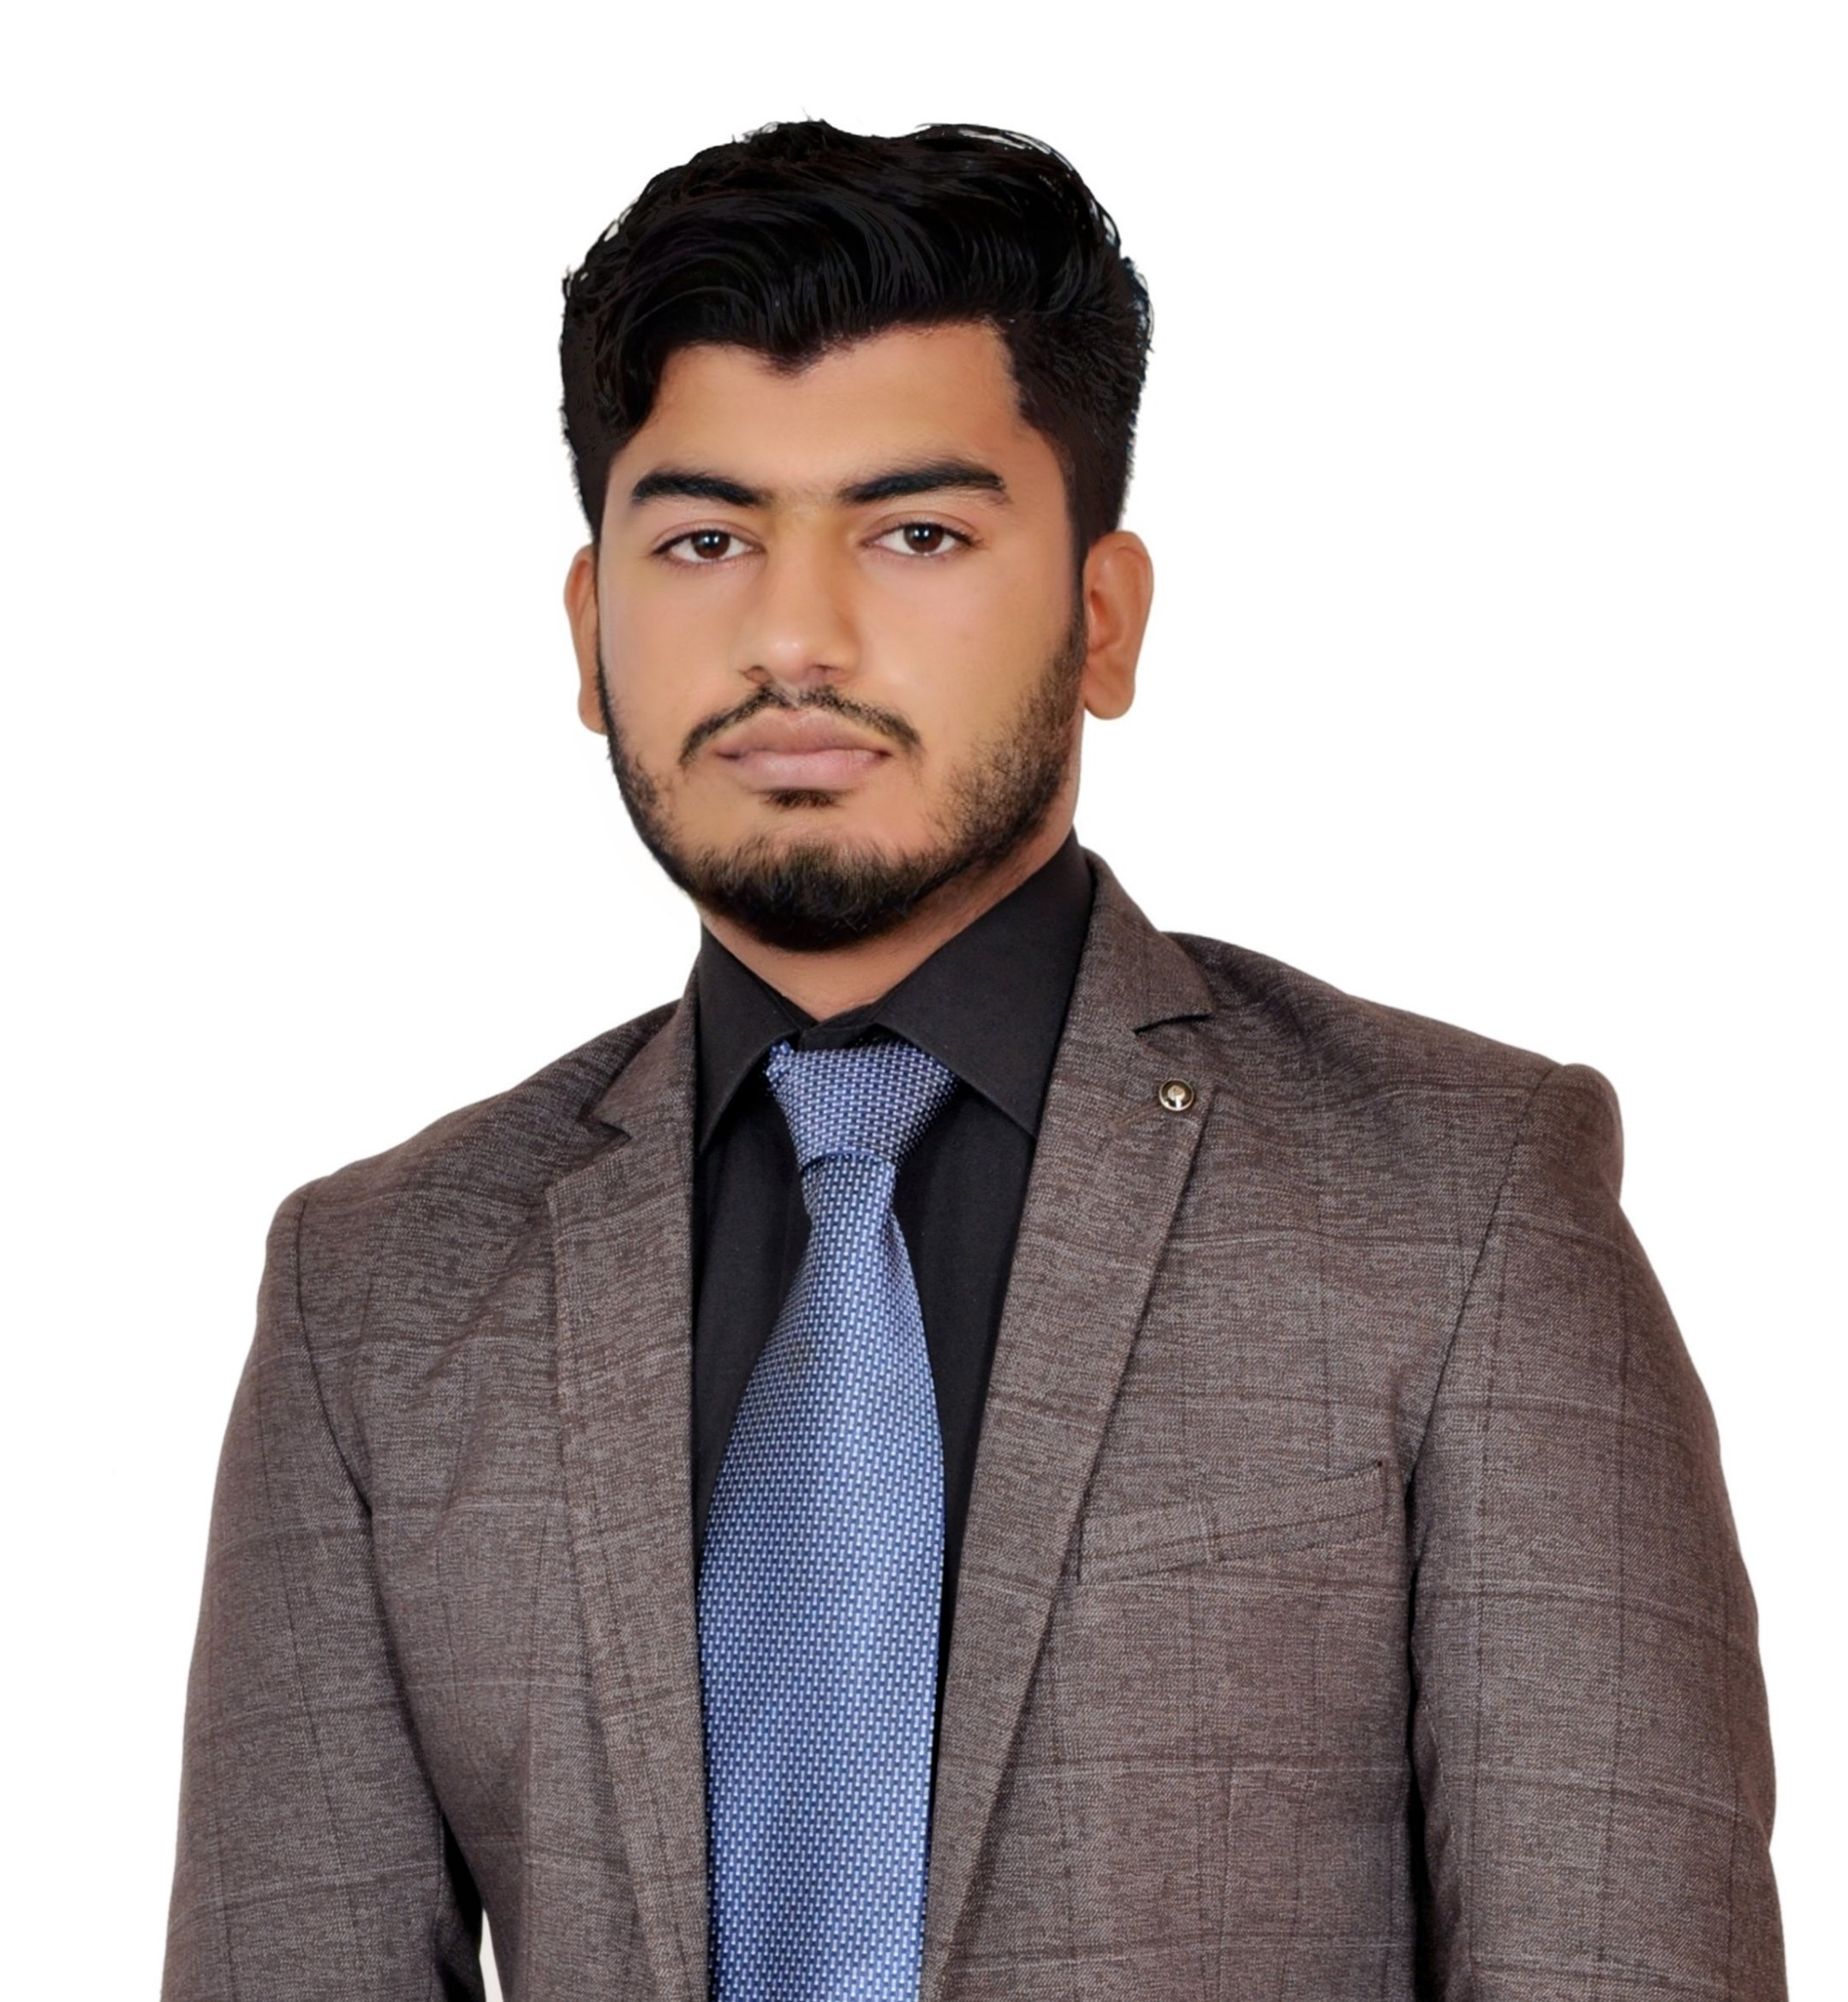 Suhail Ahmad